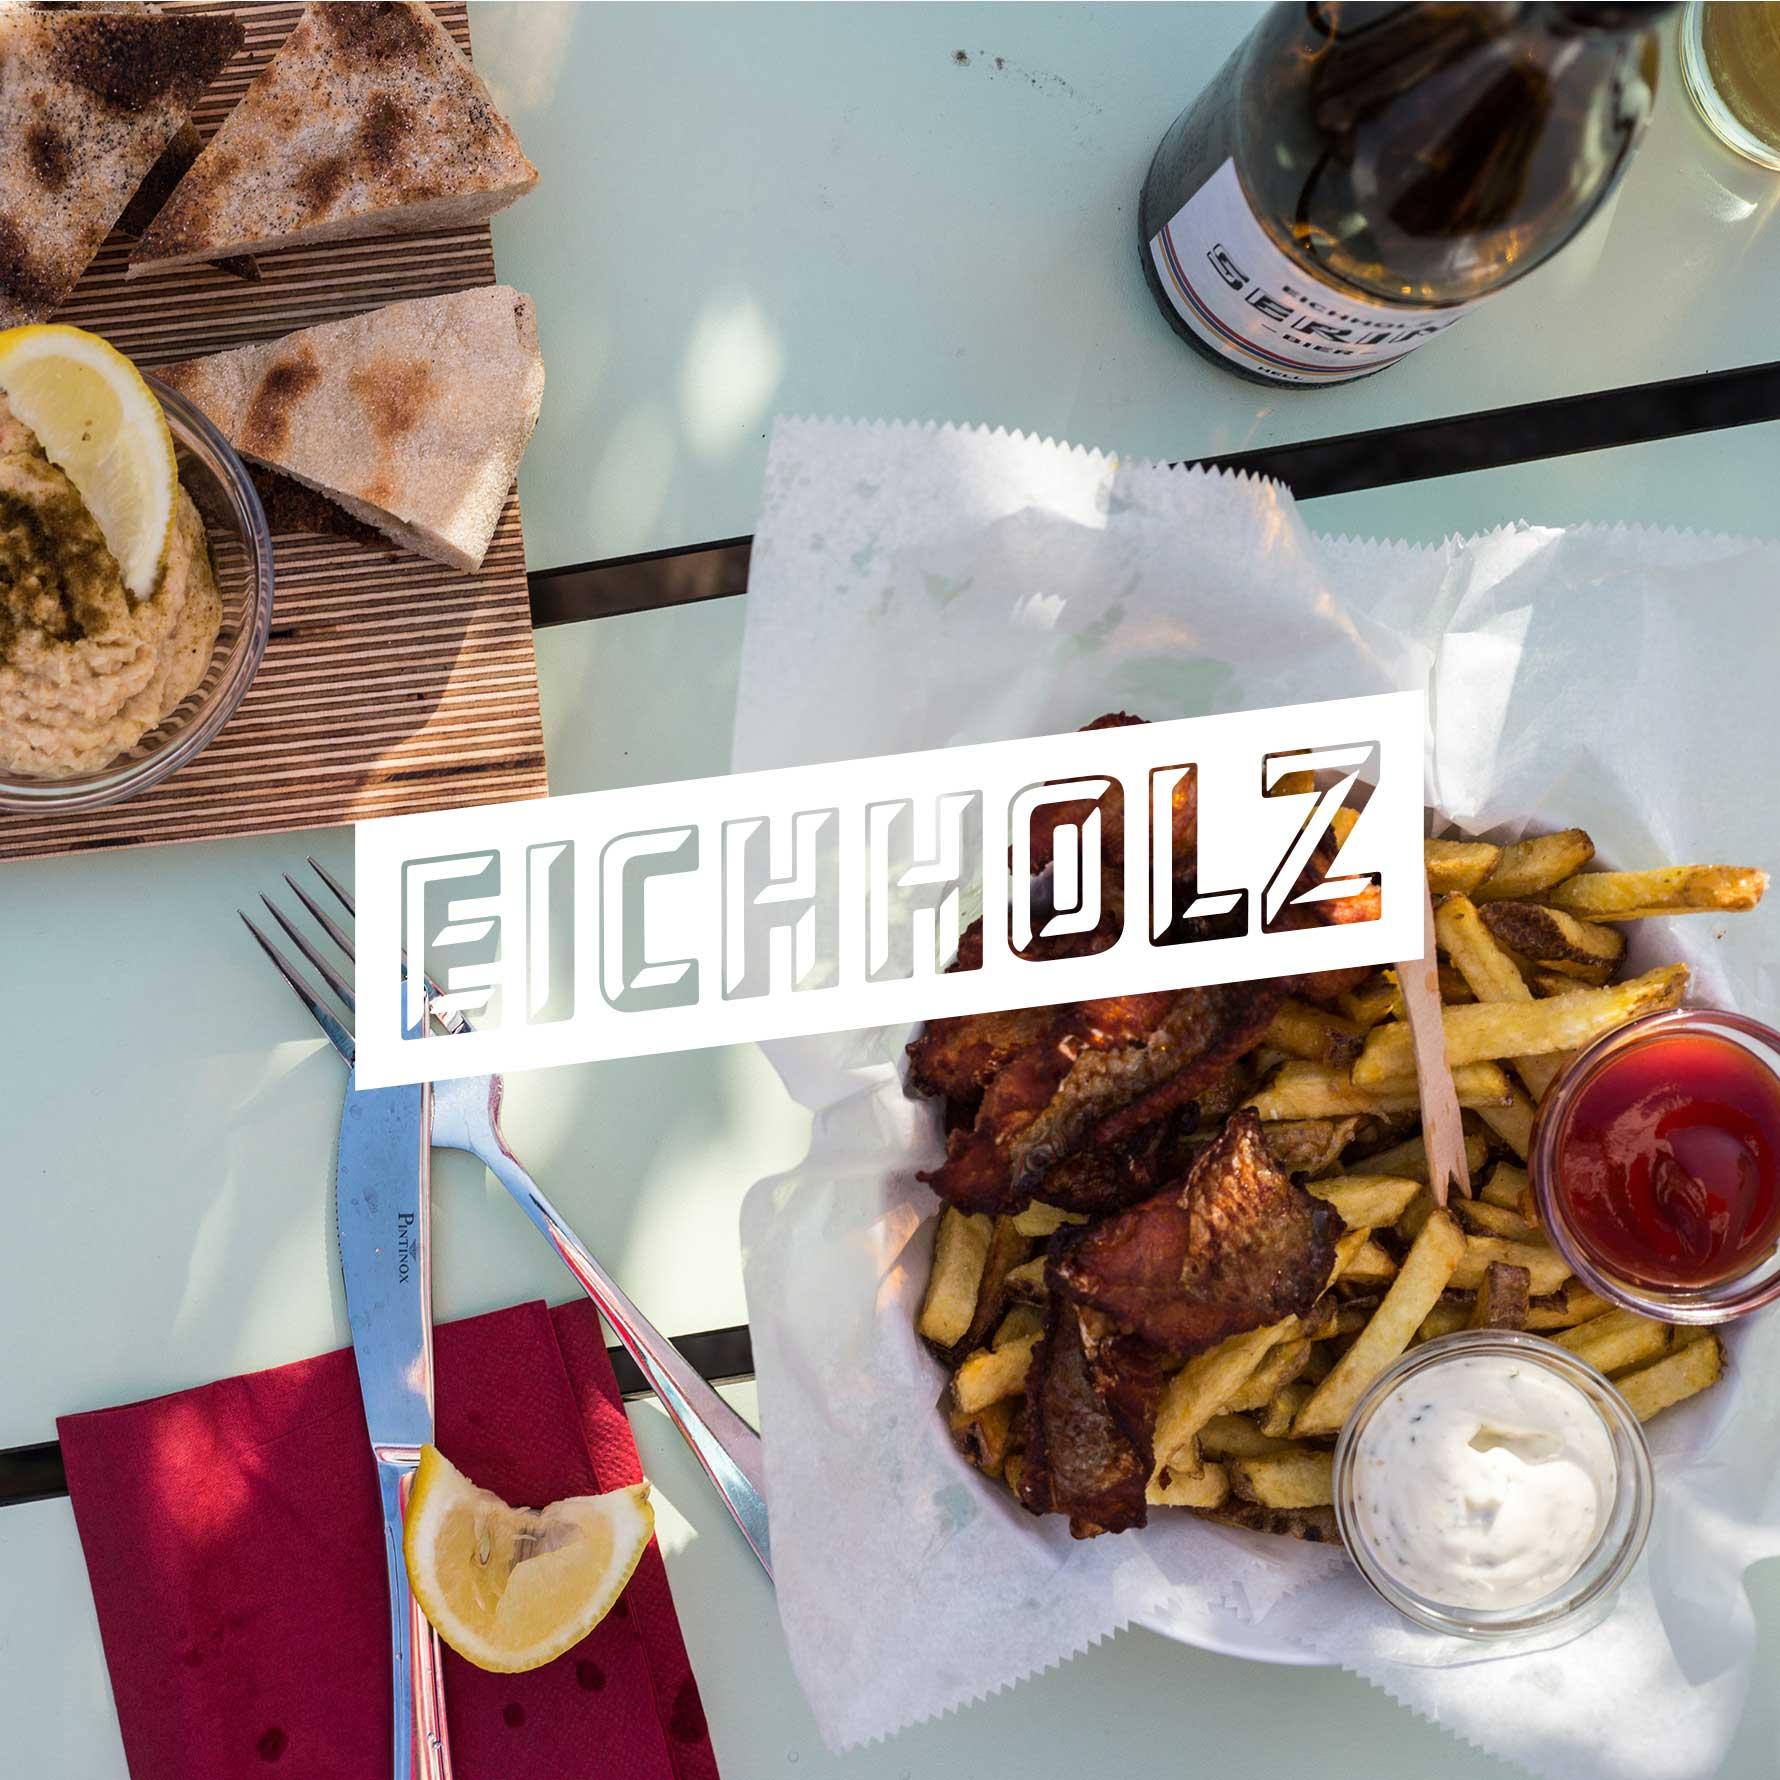 Restaurant Serini Eichholz Getraenke